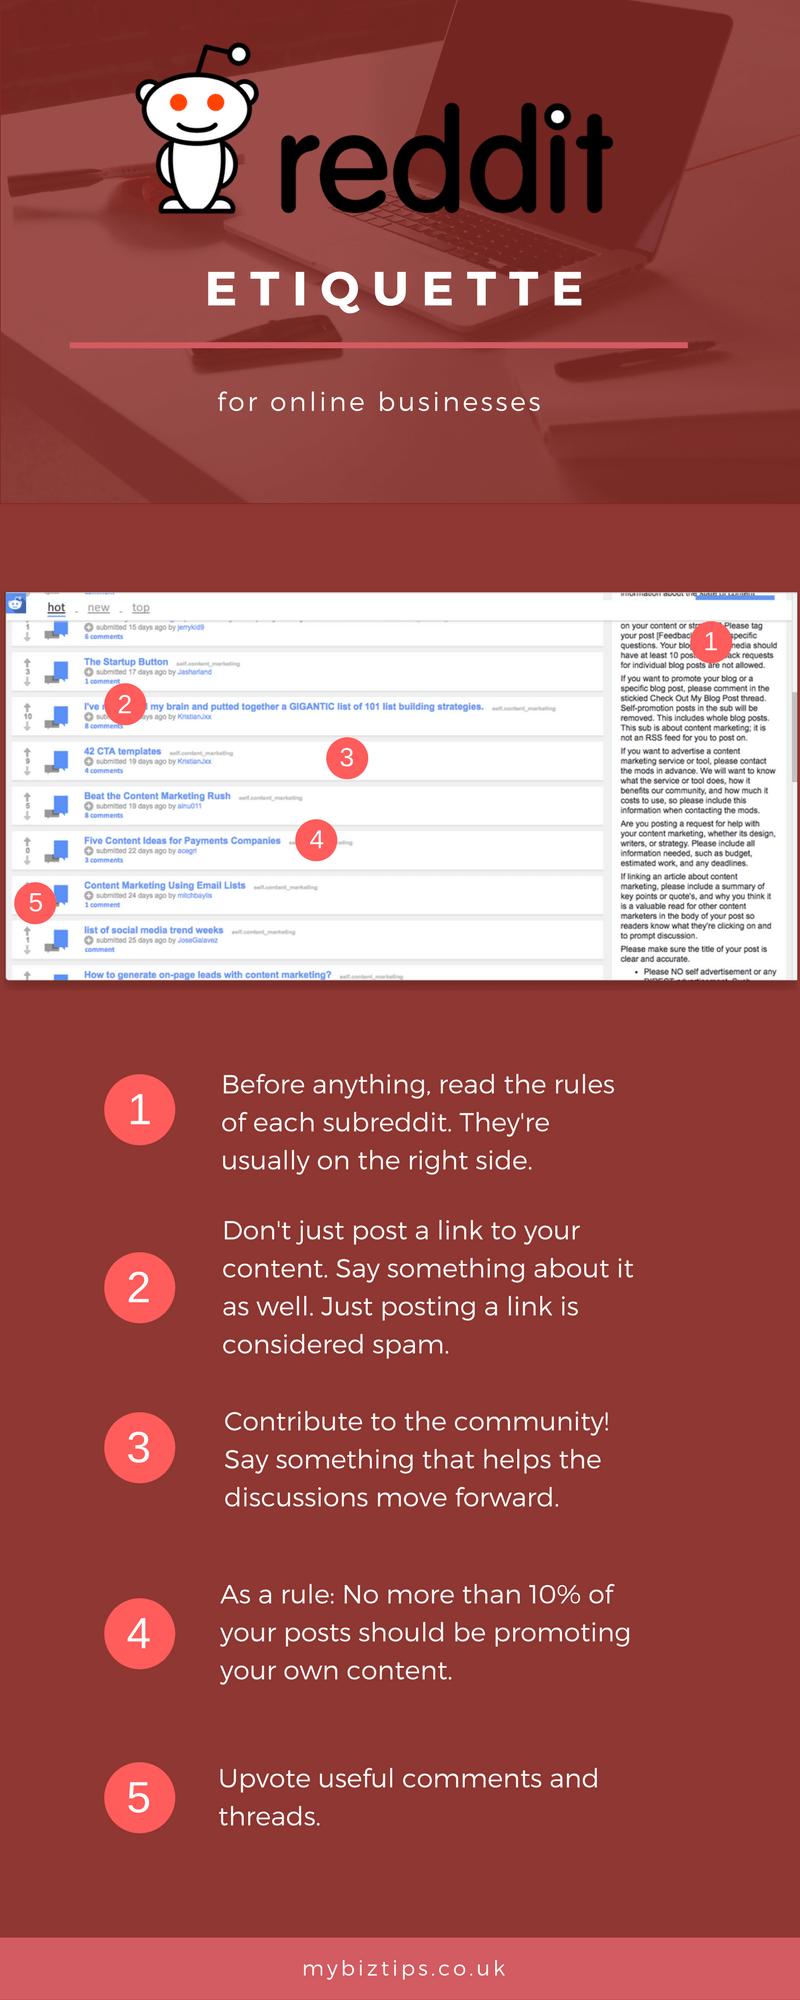 UK online business reddit